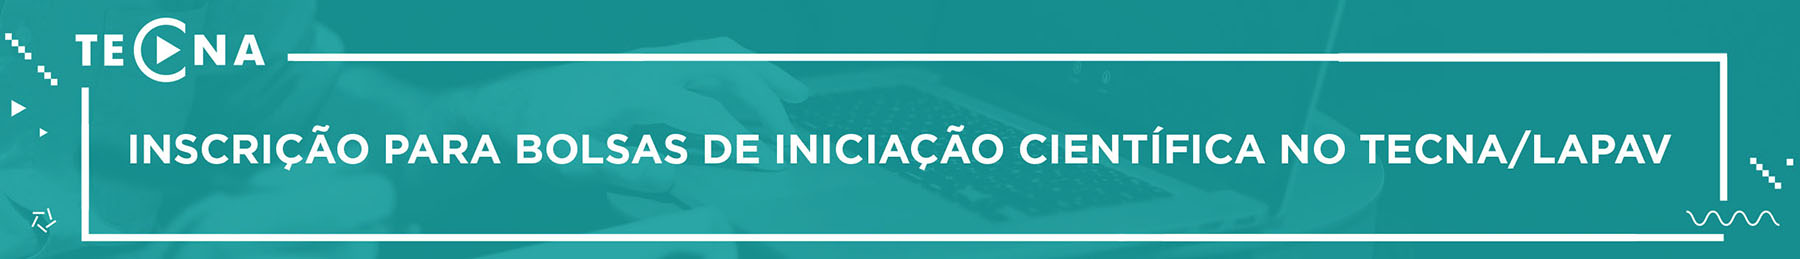 2020_03_02-tecna-banner_inscricoes_bolsas_ic-tecna-lapav